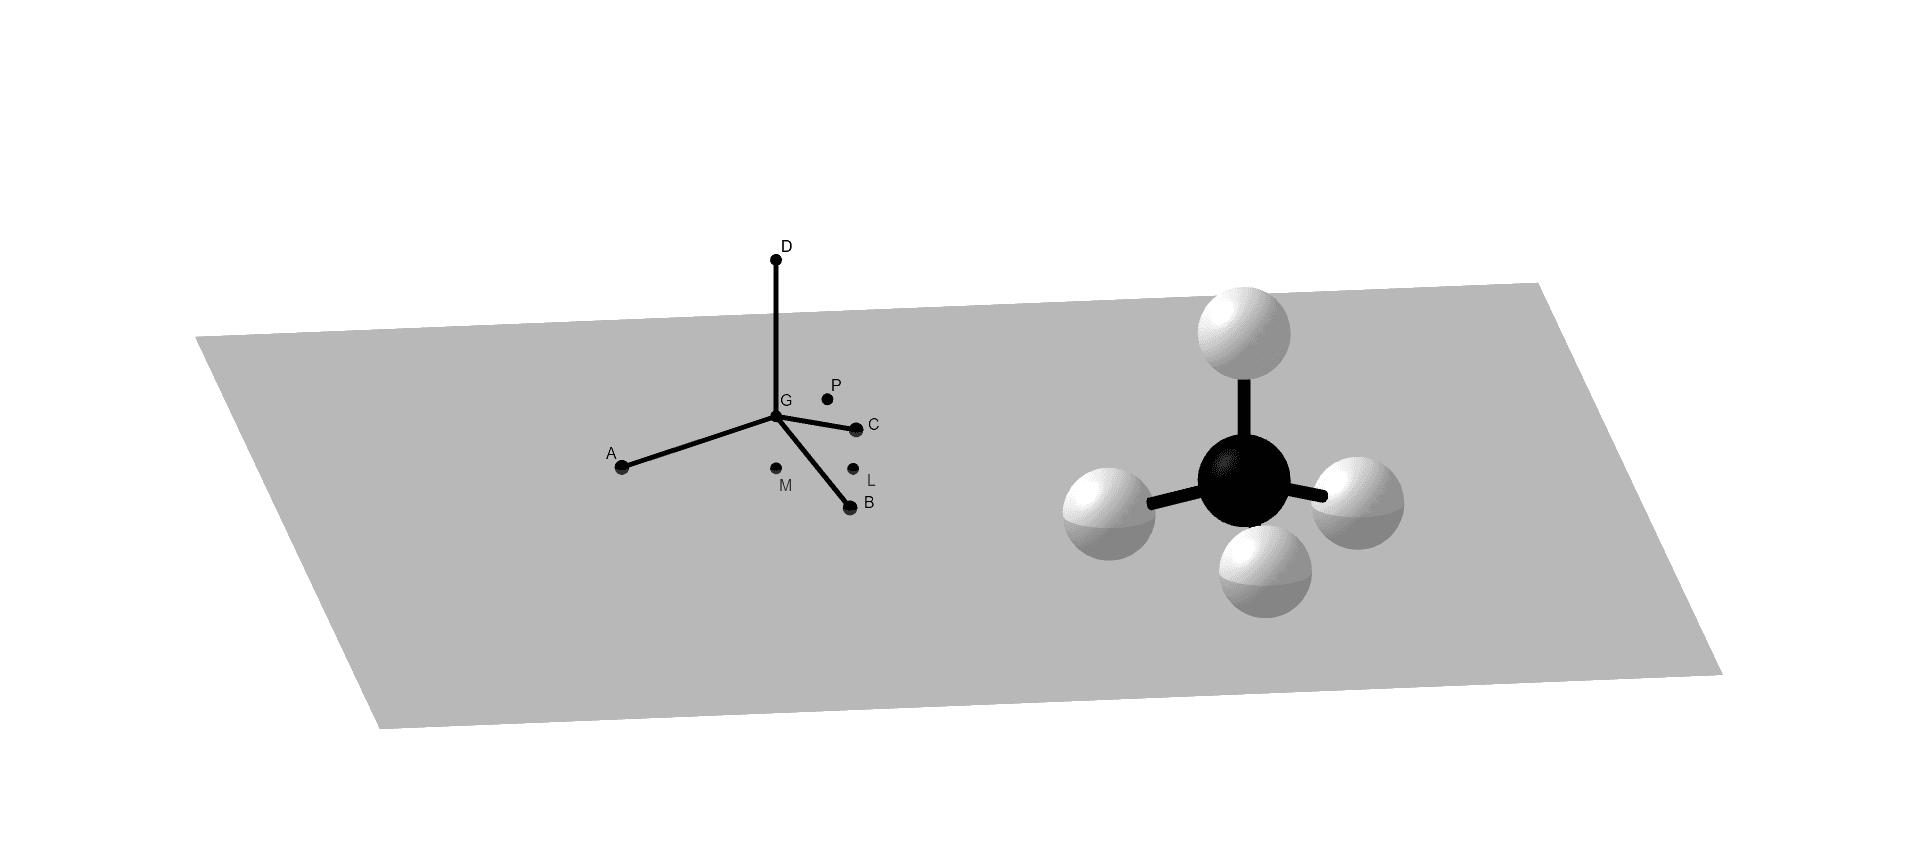 Molécula de Metano - CH4 - Jonas Barletta Press Enter to start activity